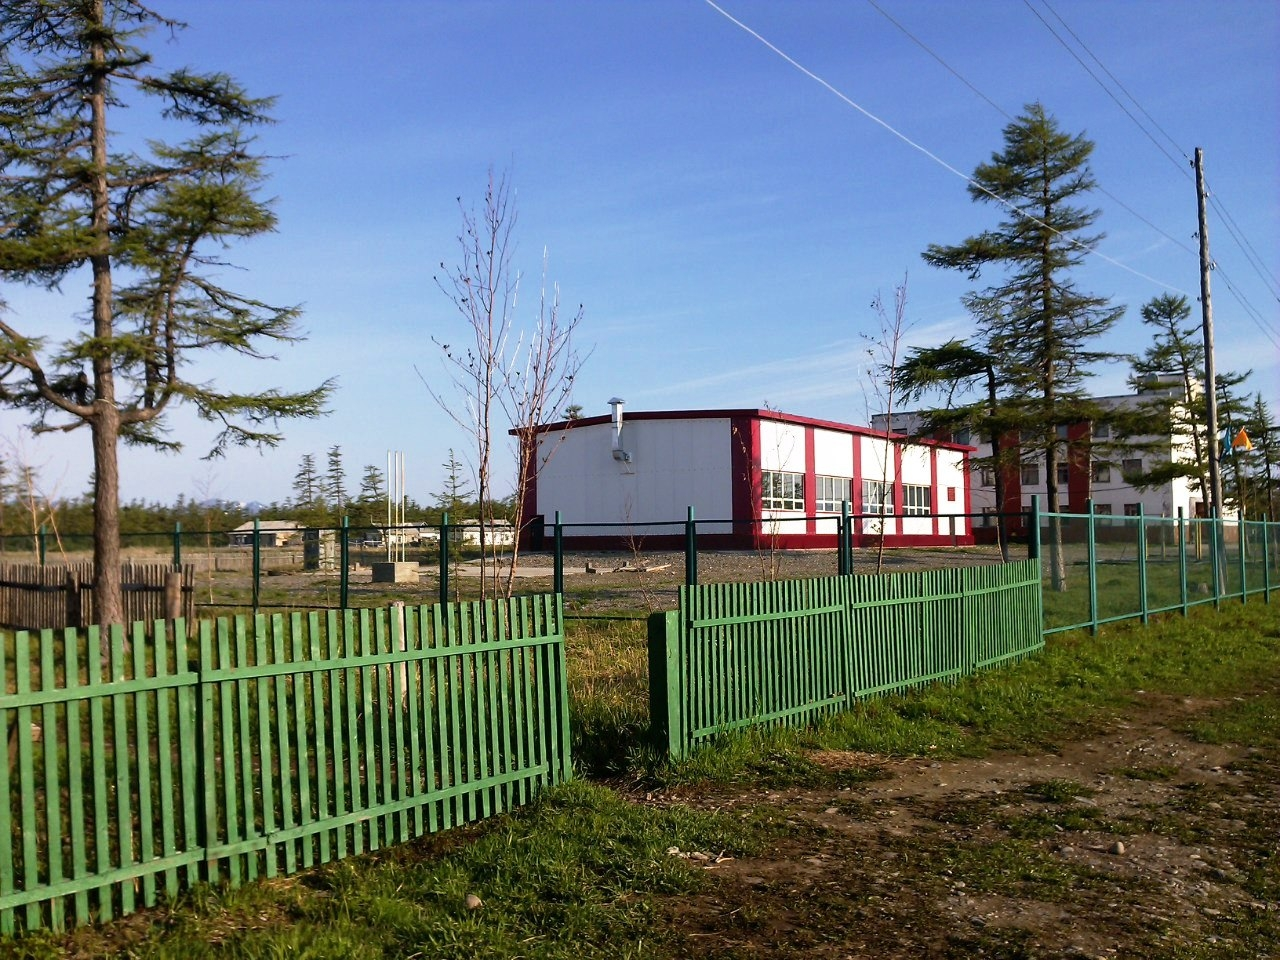 Школа в селе Тахтоямск. Фото из архива Владимира Могучего.